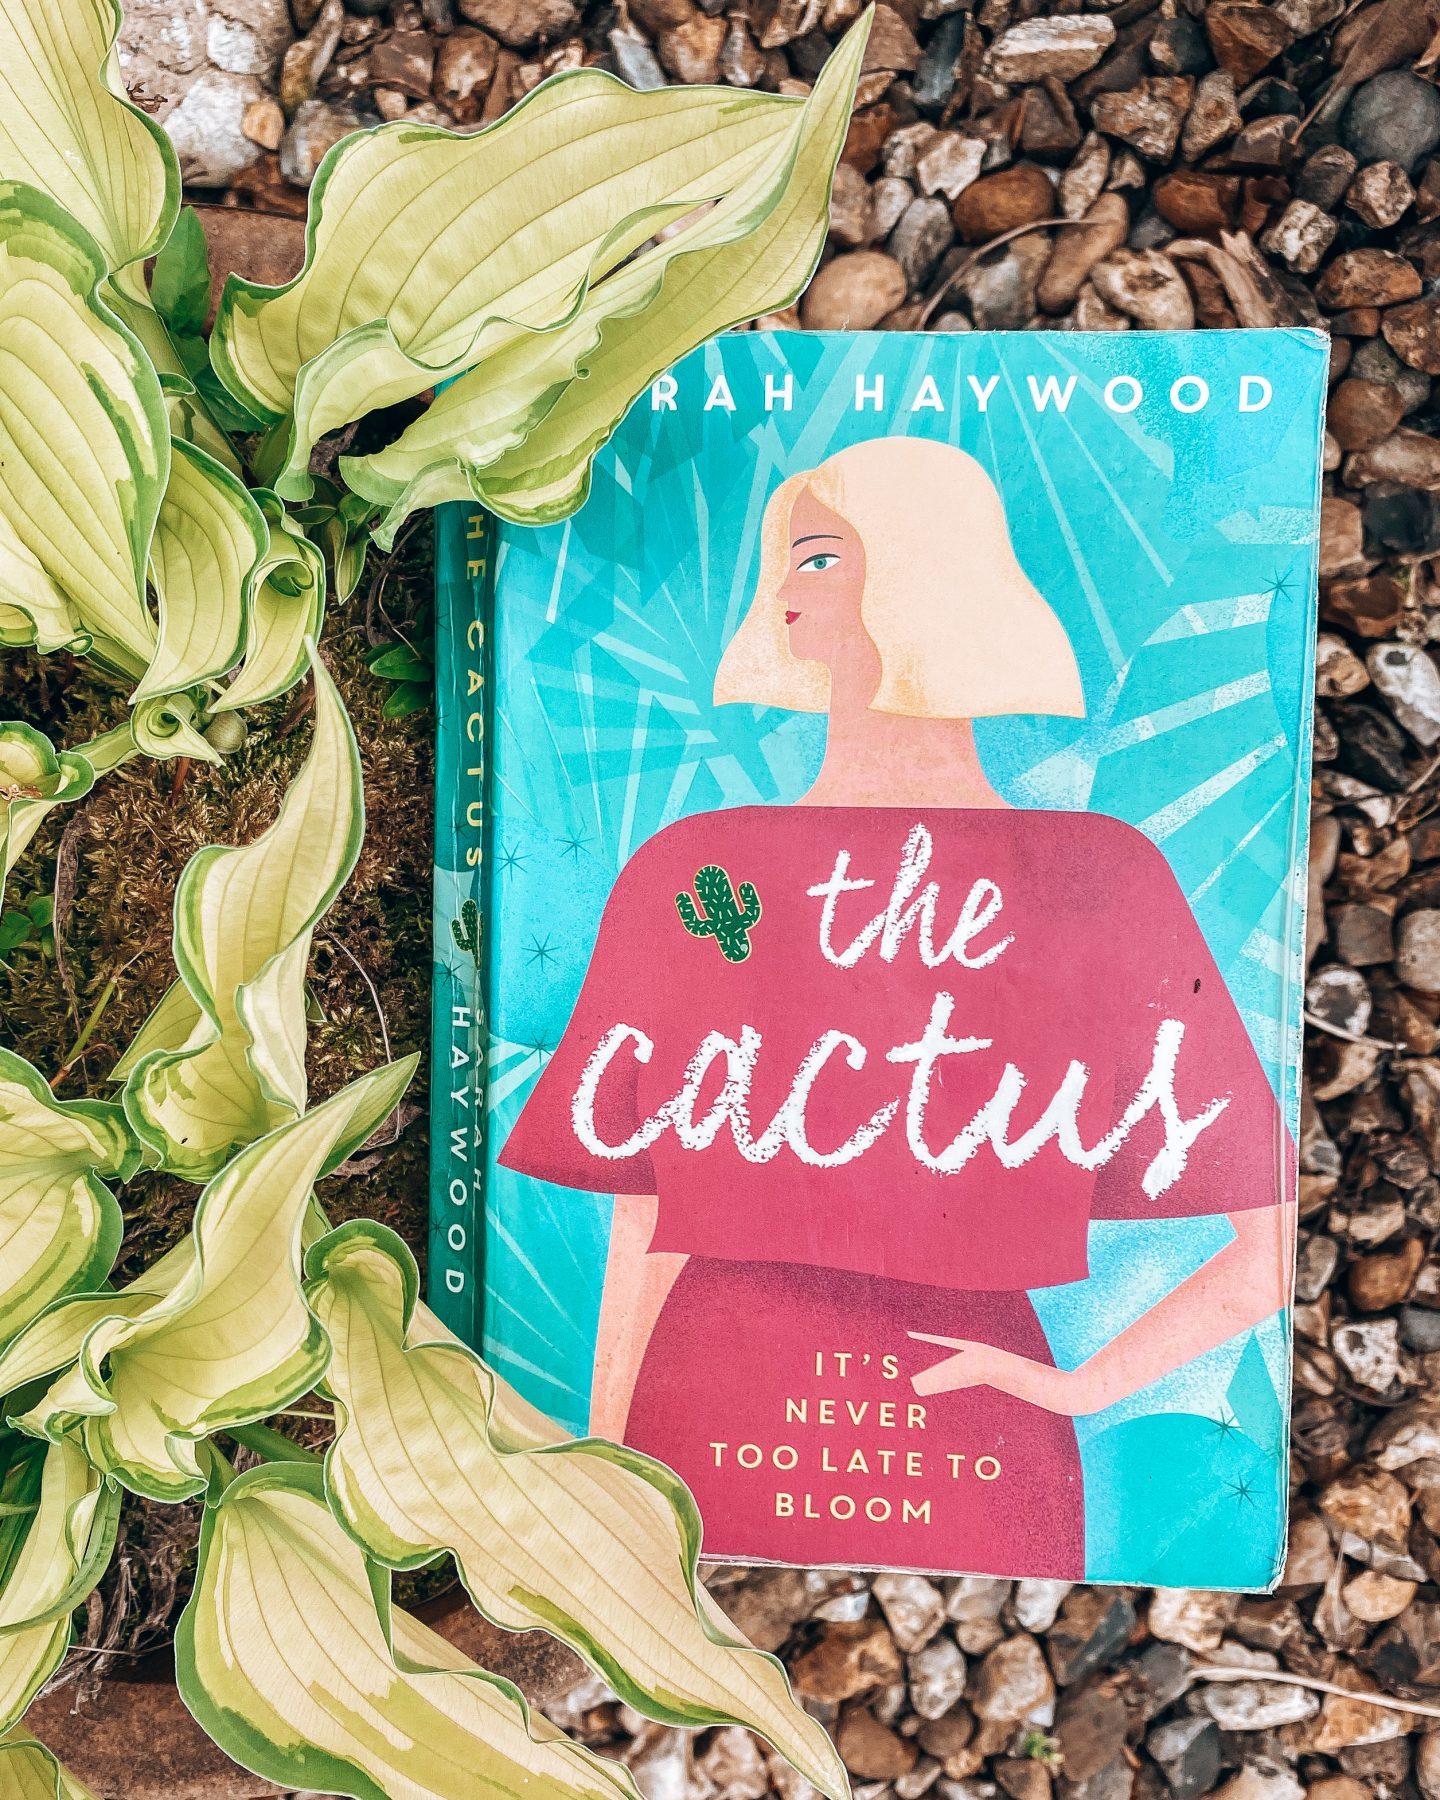 The Cactus book next to a green foliage